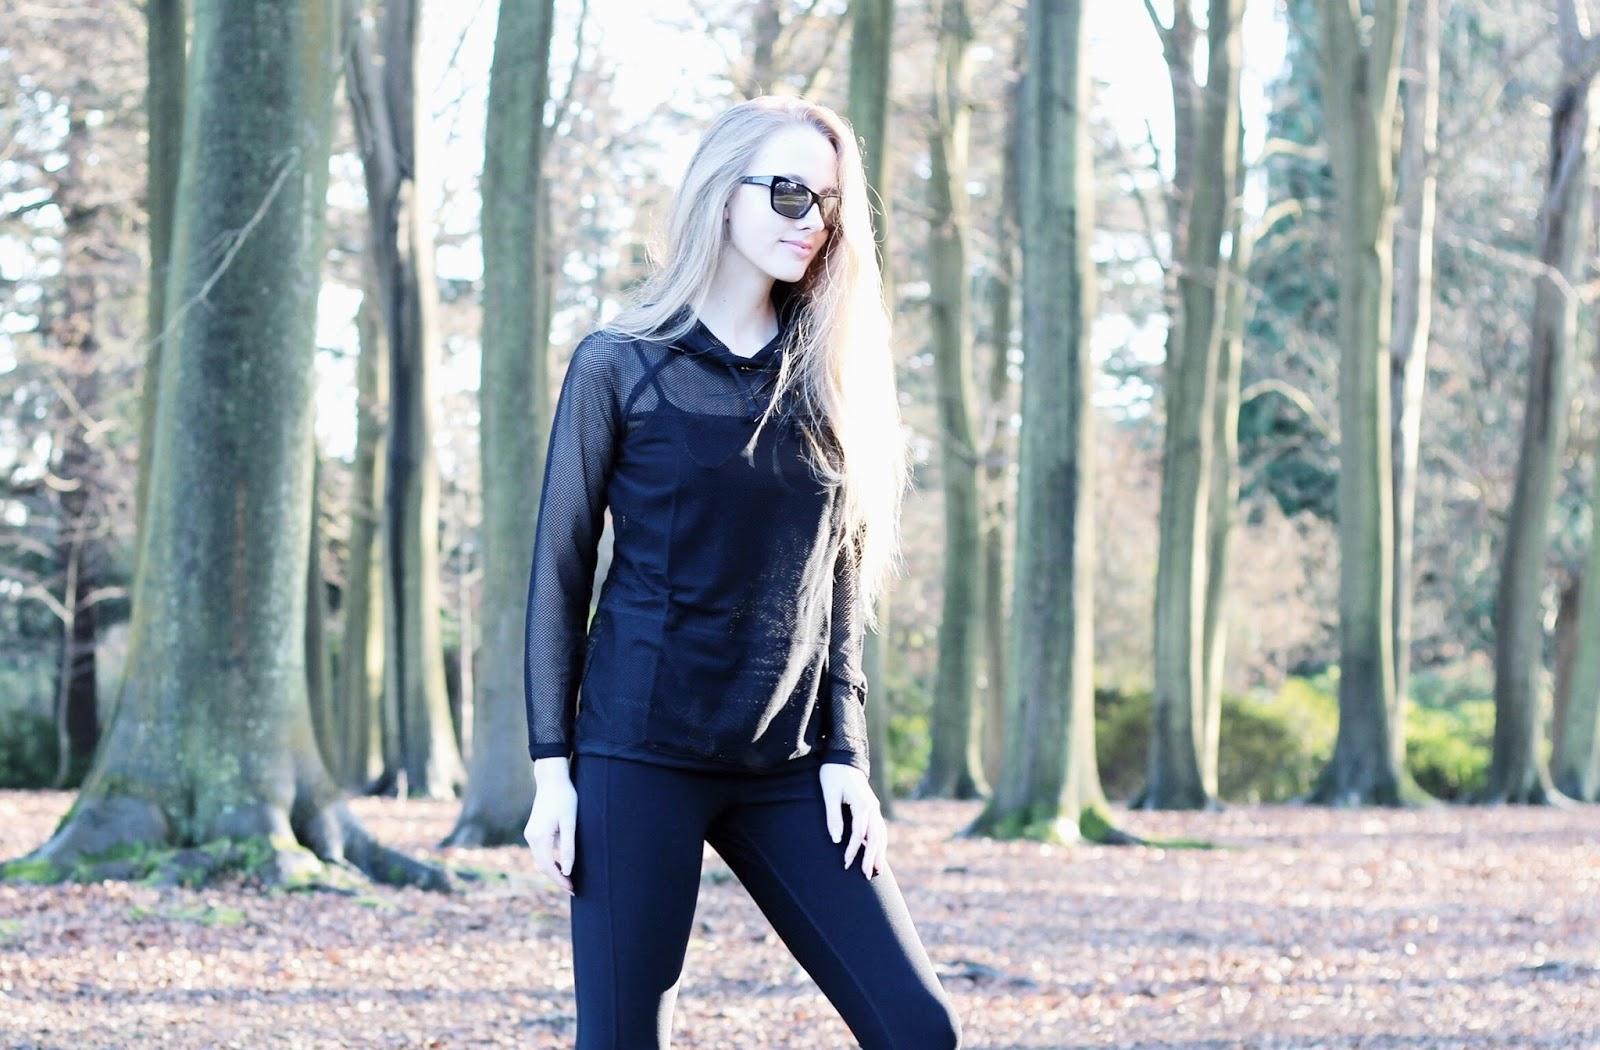 All black fitnesswear mesh top